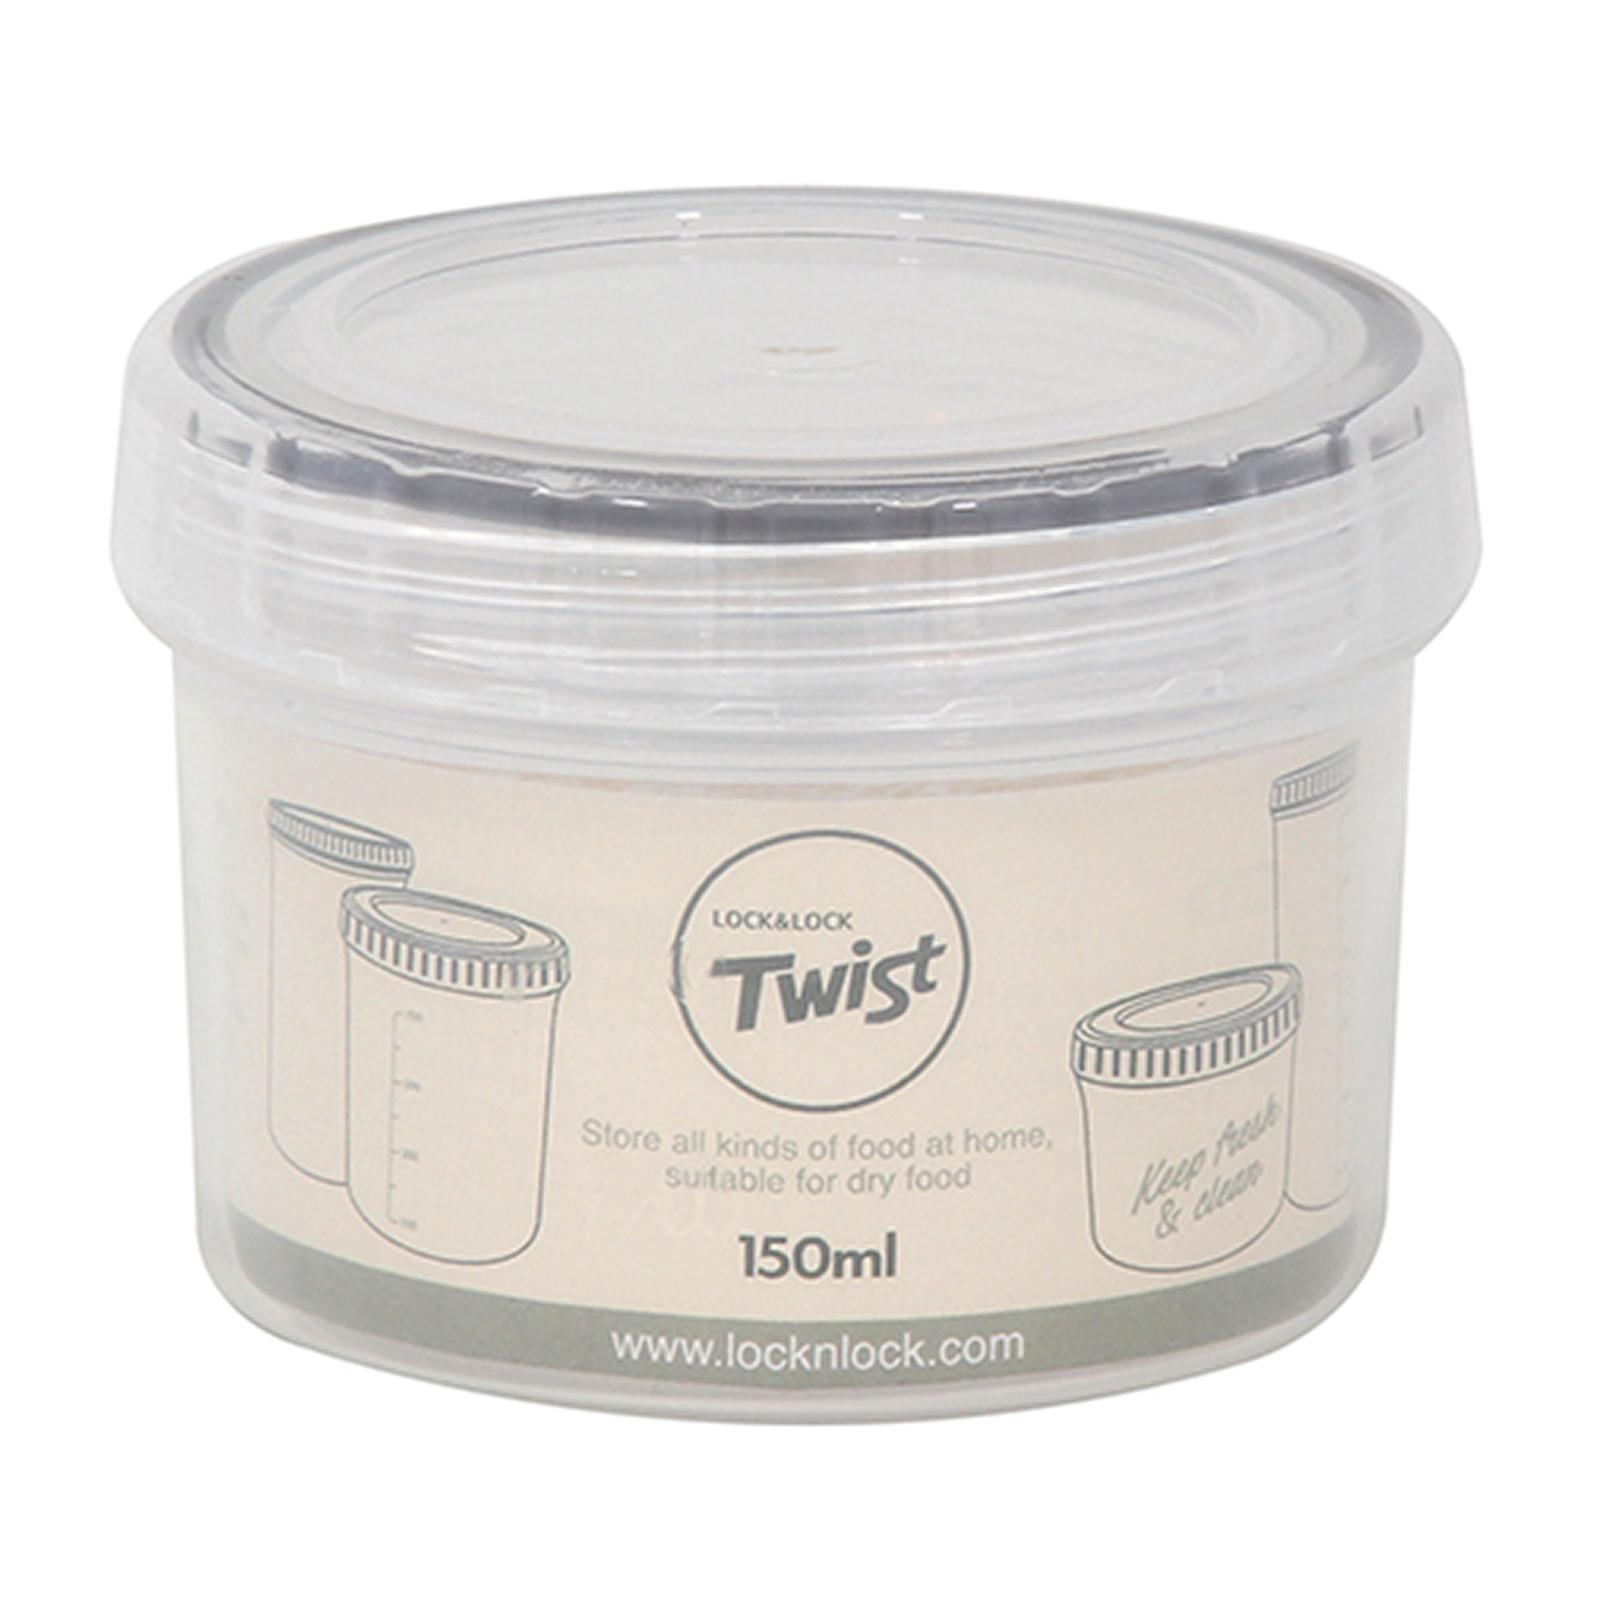 LOCK & LOCK Twist Container 150Ml White